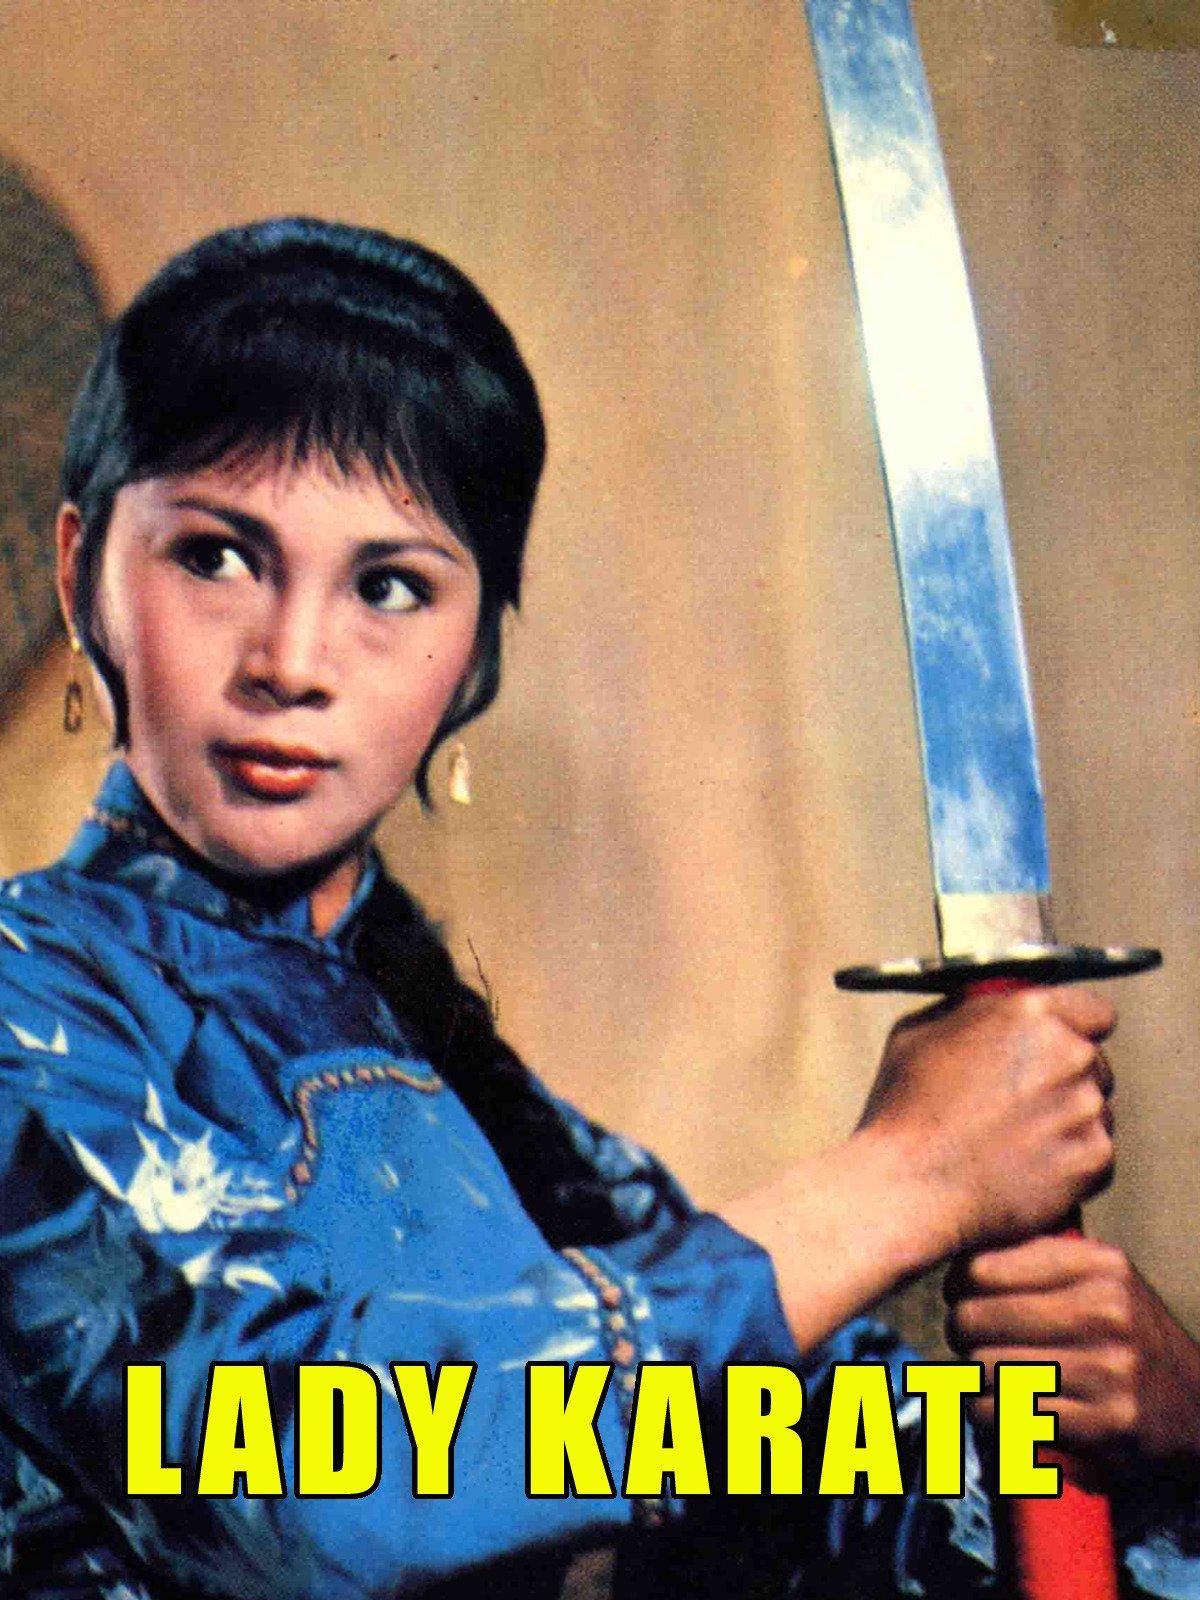 Lady Karate